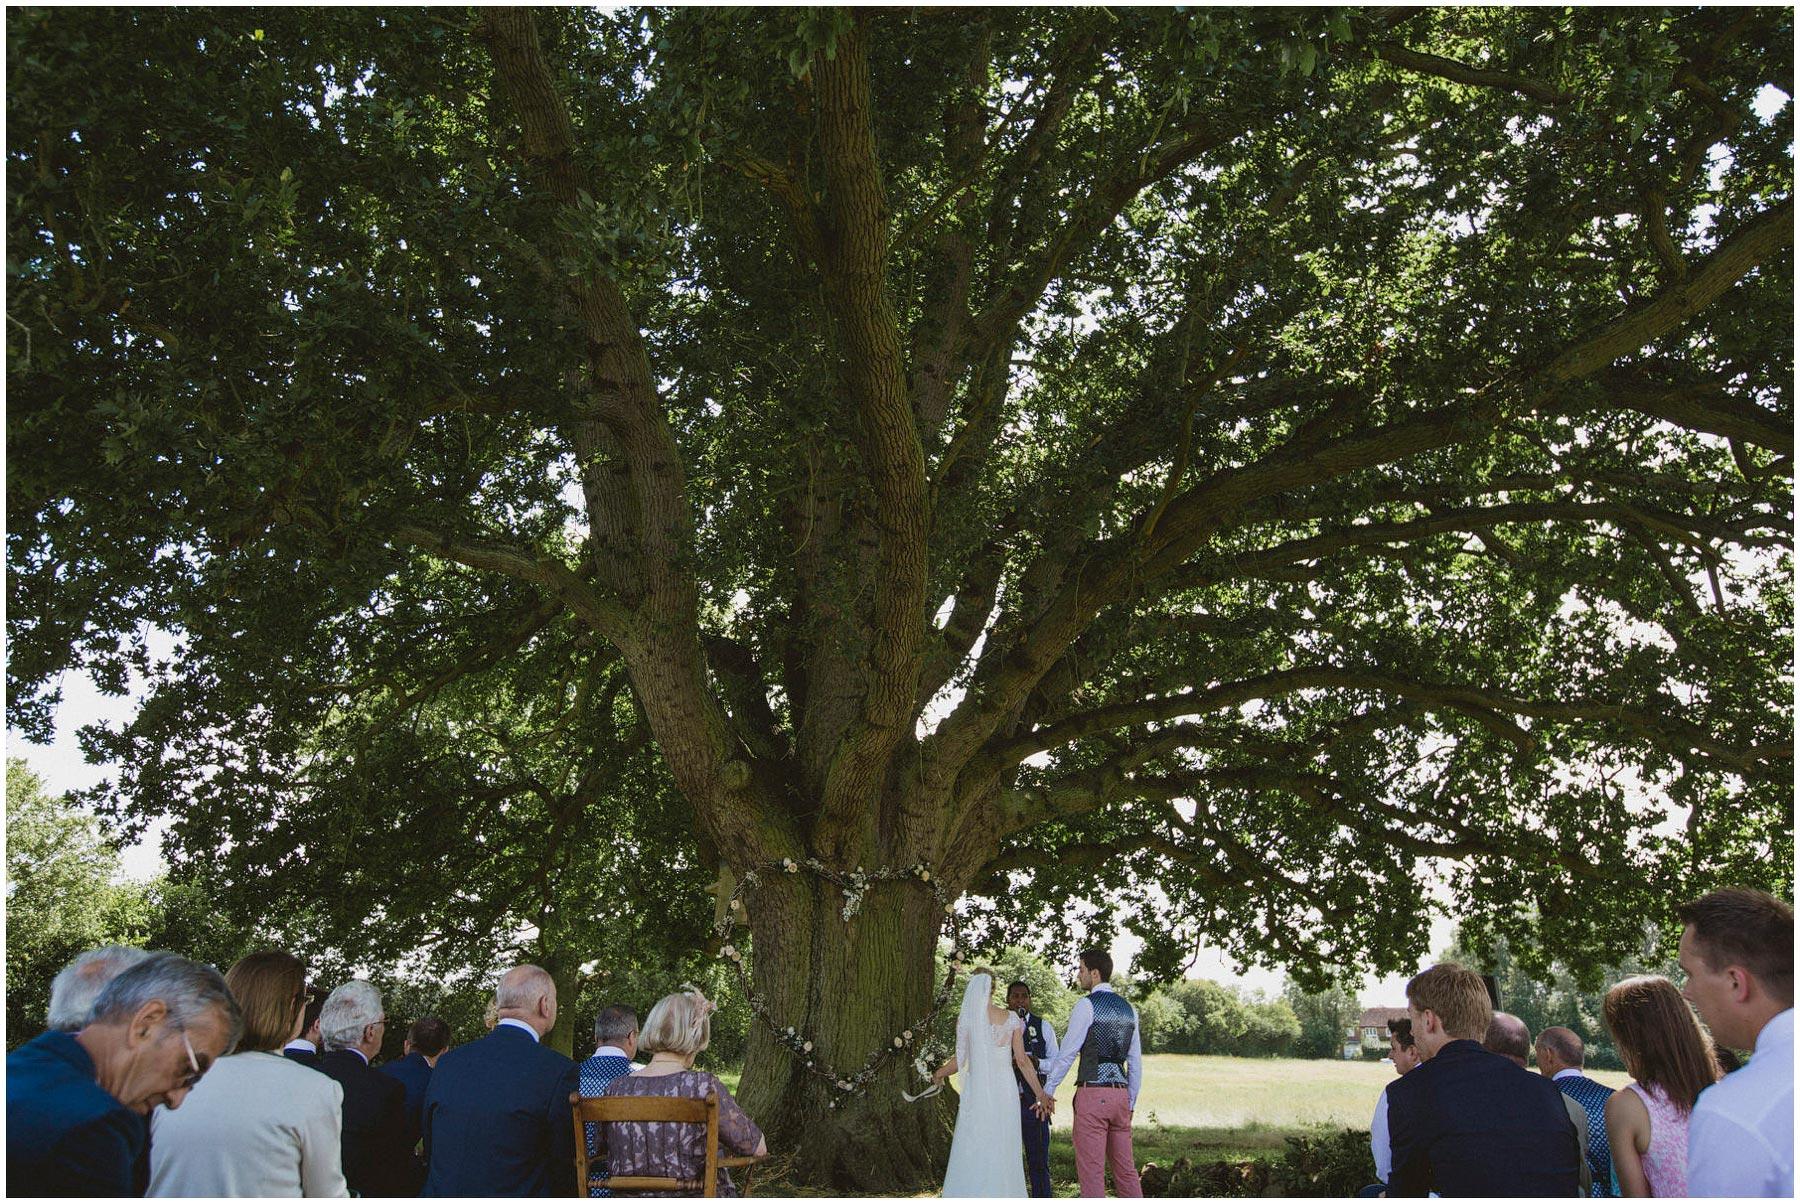 Kent-Festival-Tipi-wedding-photography_0065